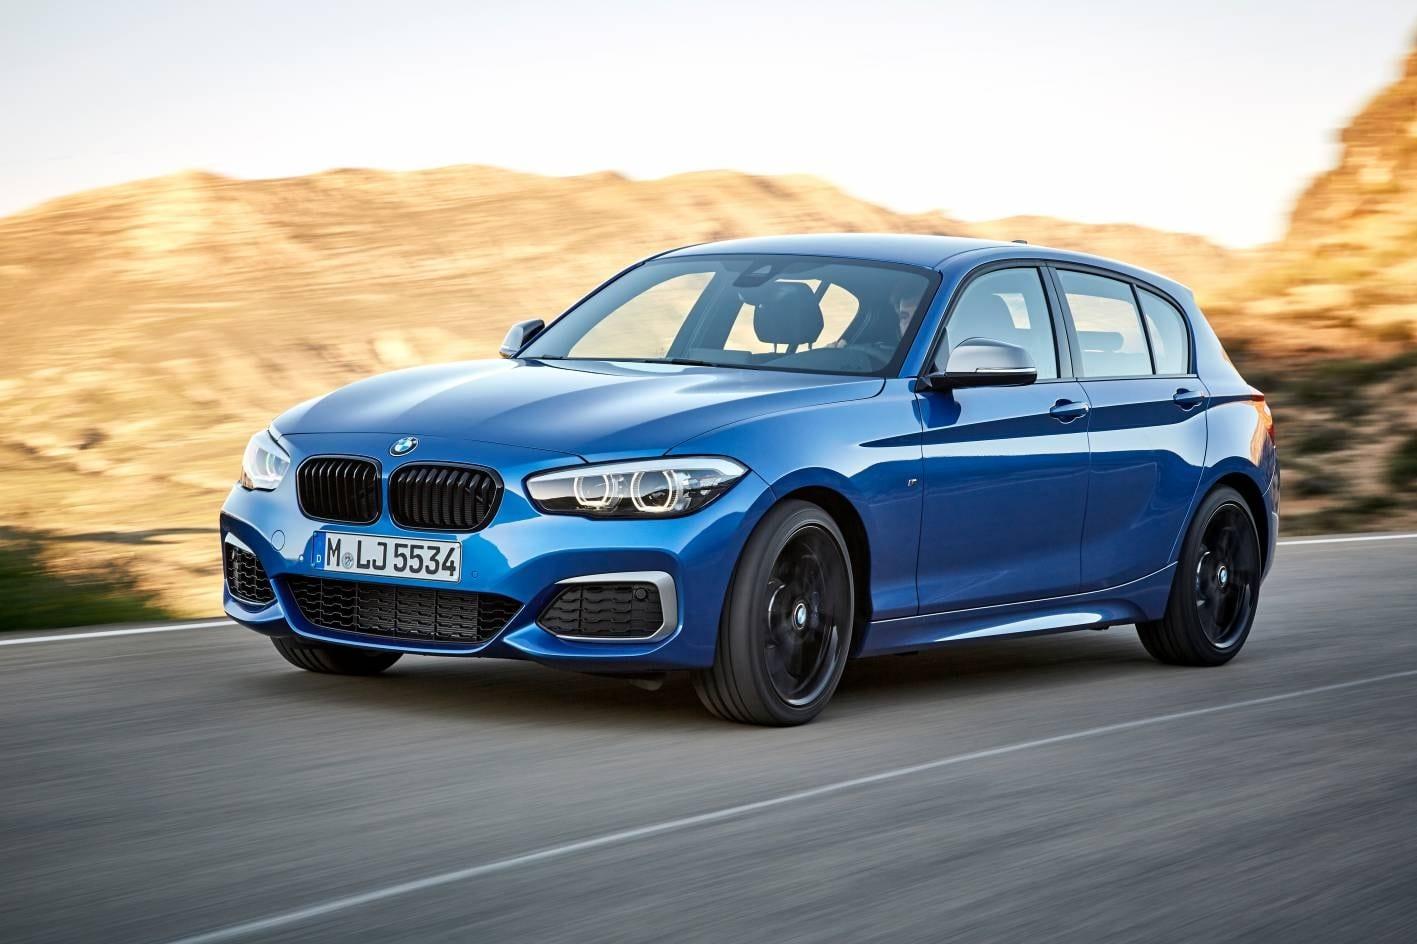 2020 BMW 1 Series Concept